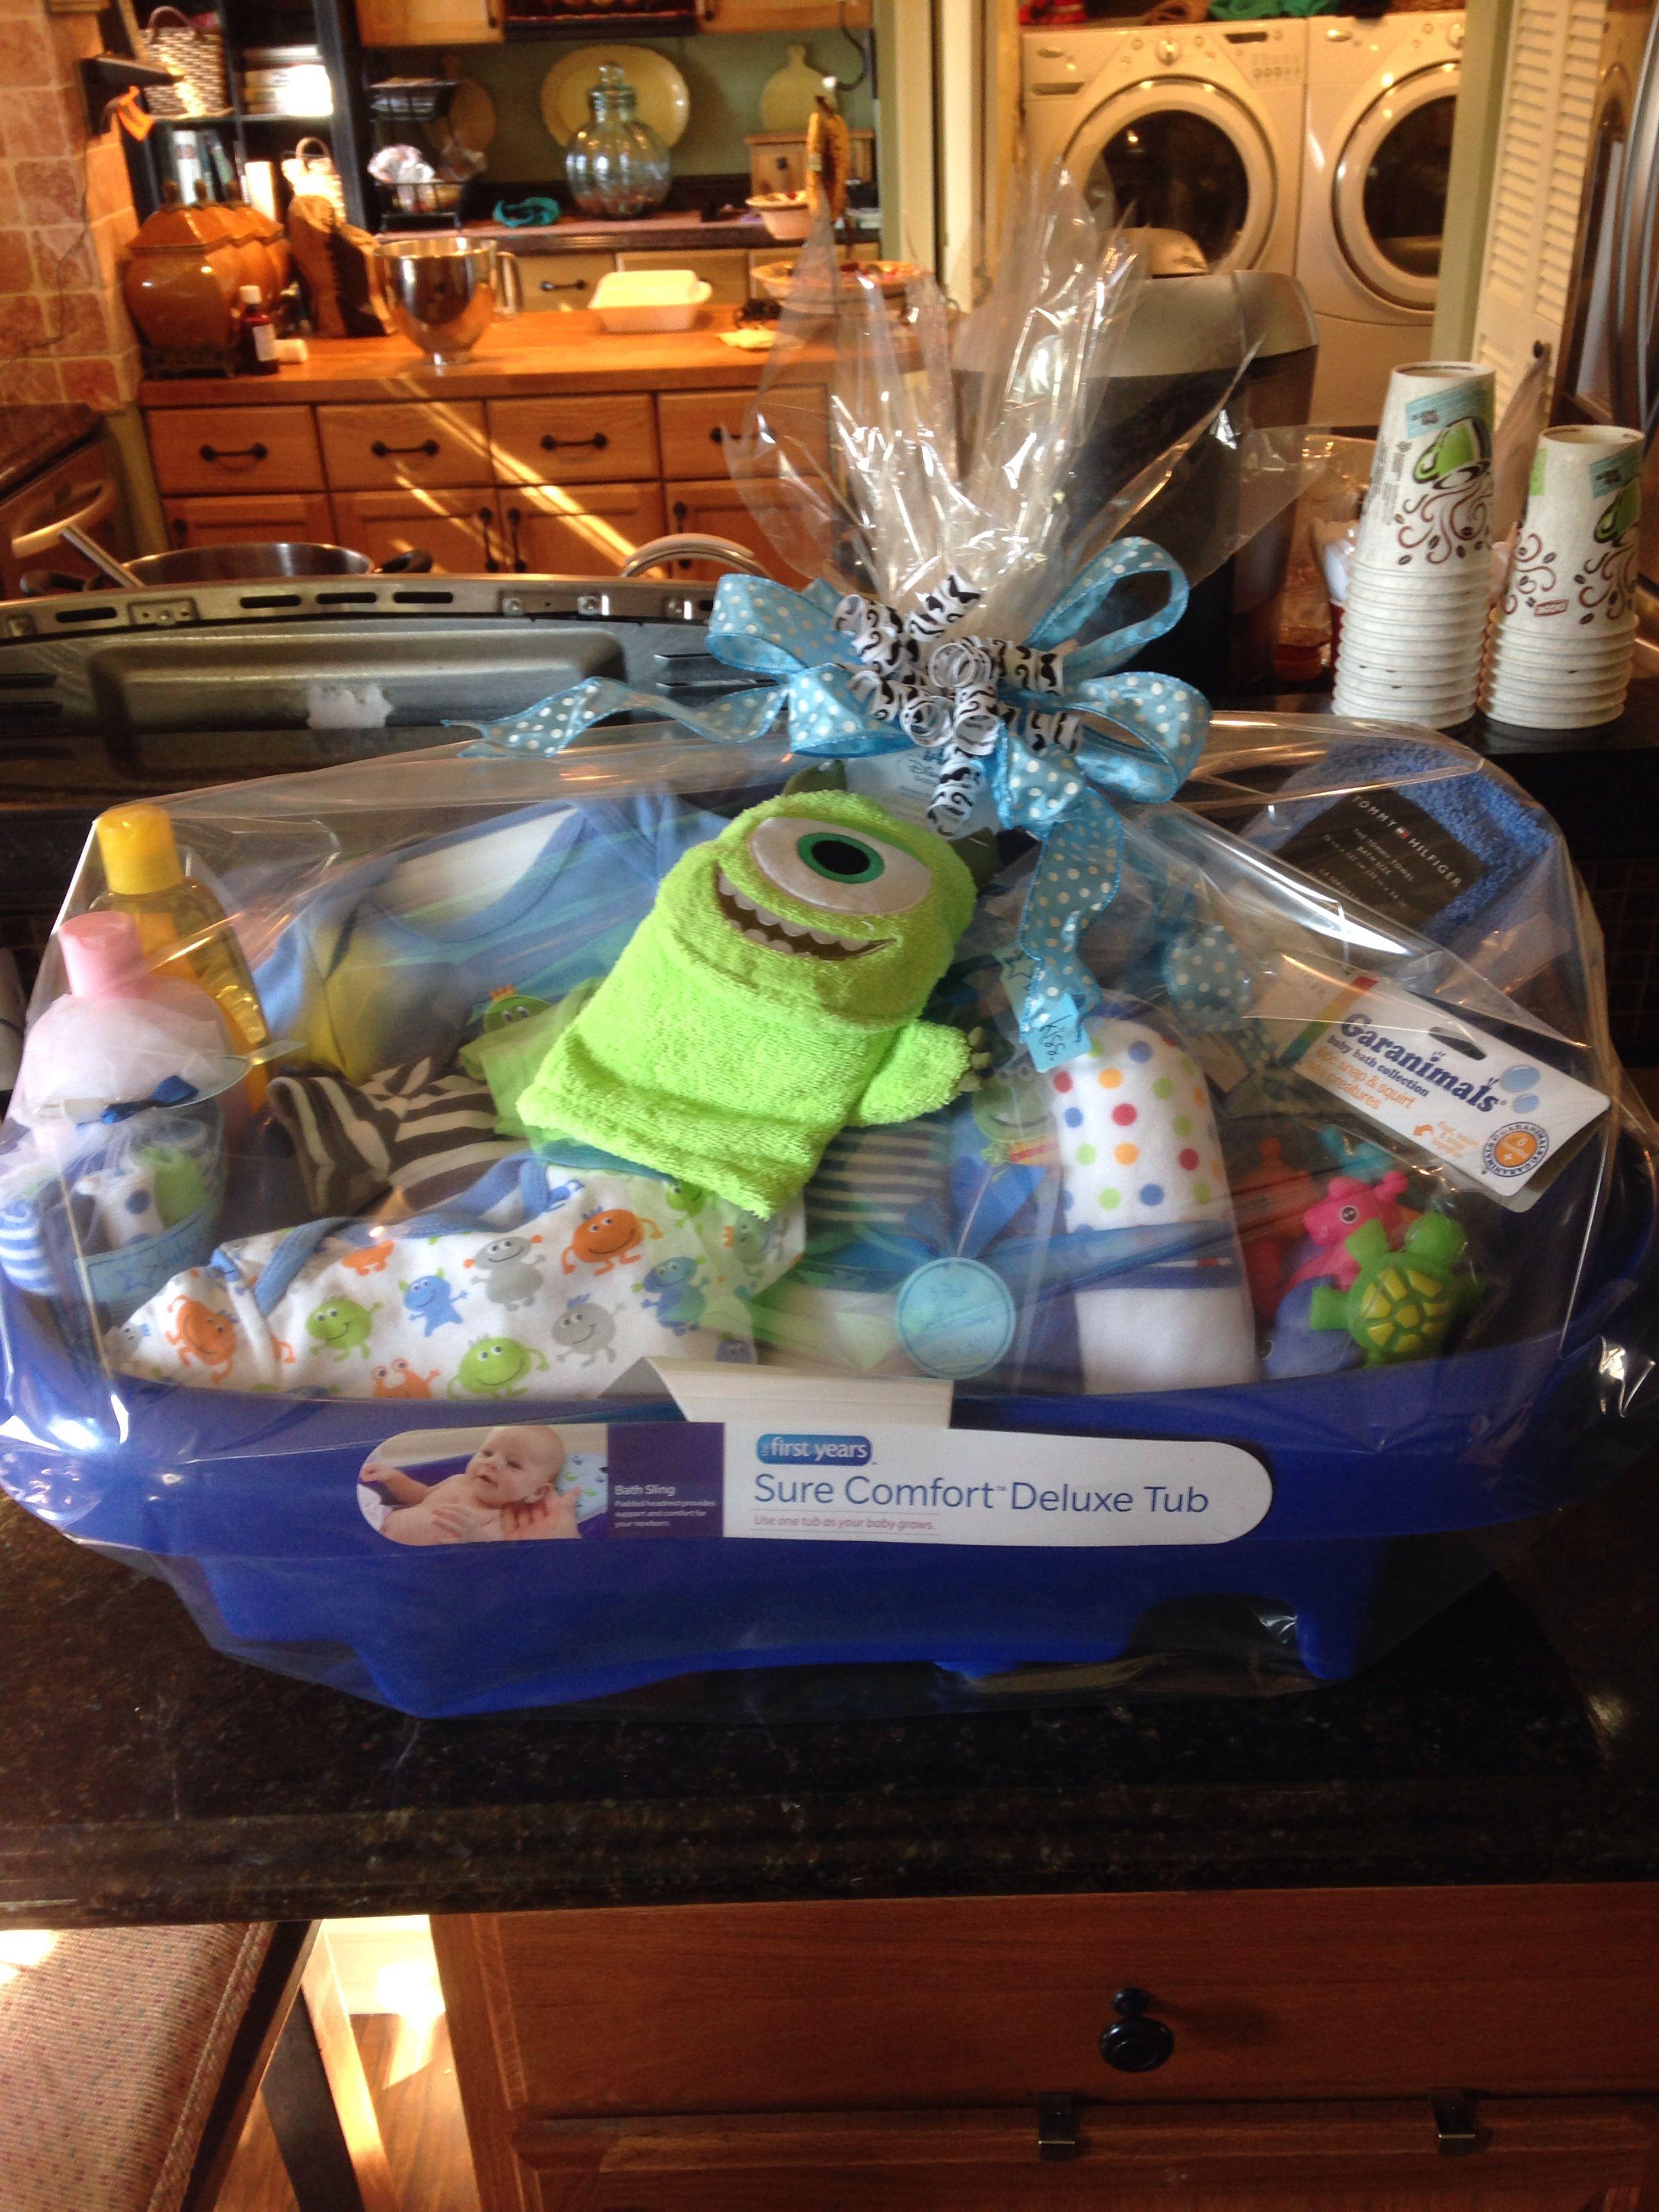 Baby Shower Gift Basket In Infant Bathtub Practical Yet Very Cute